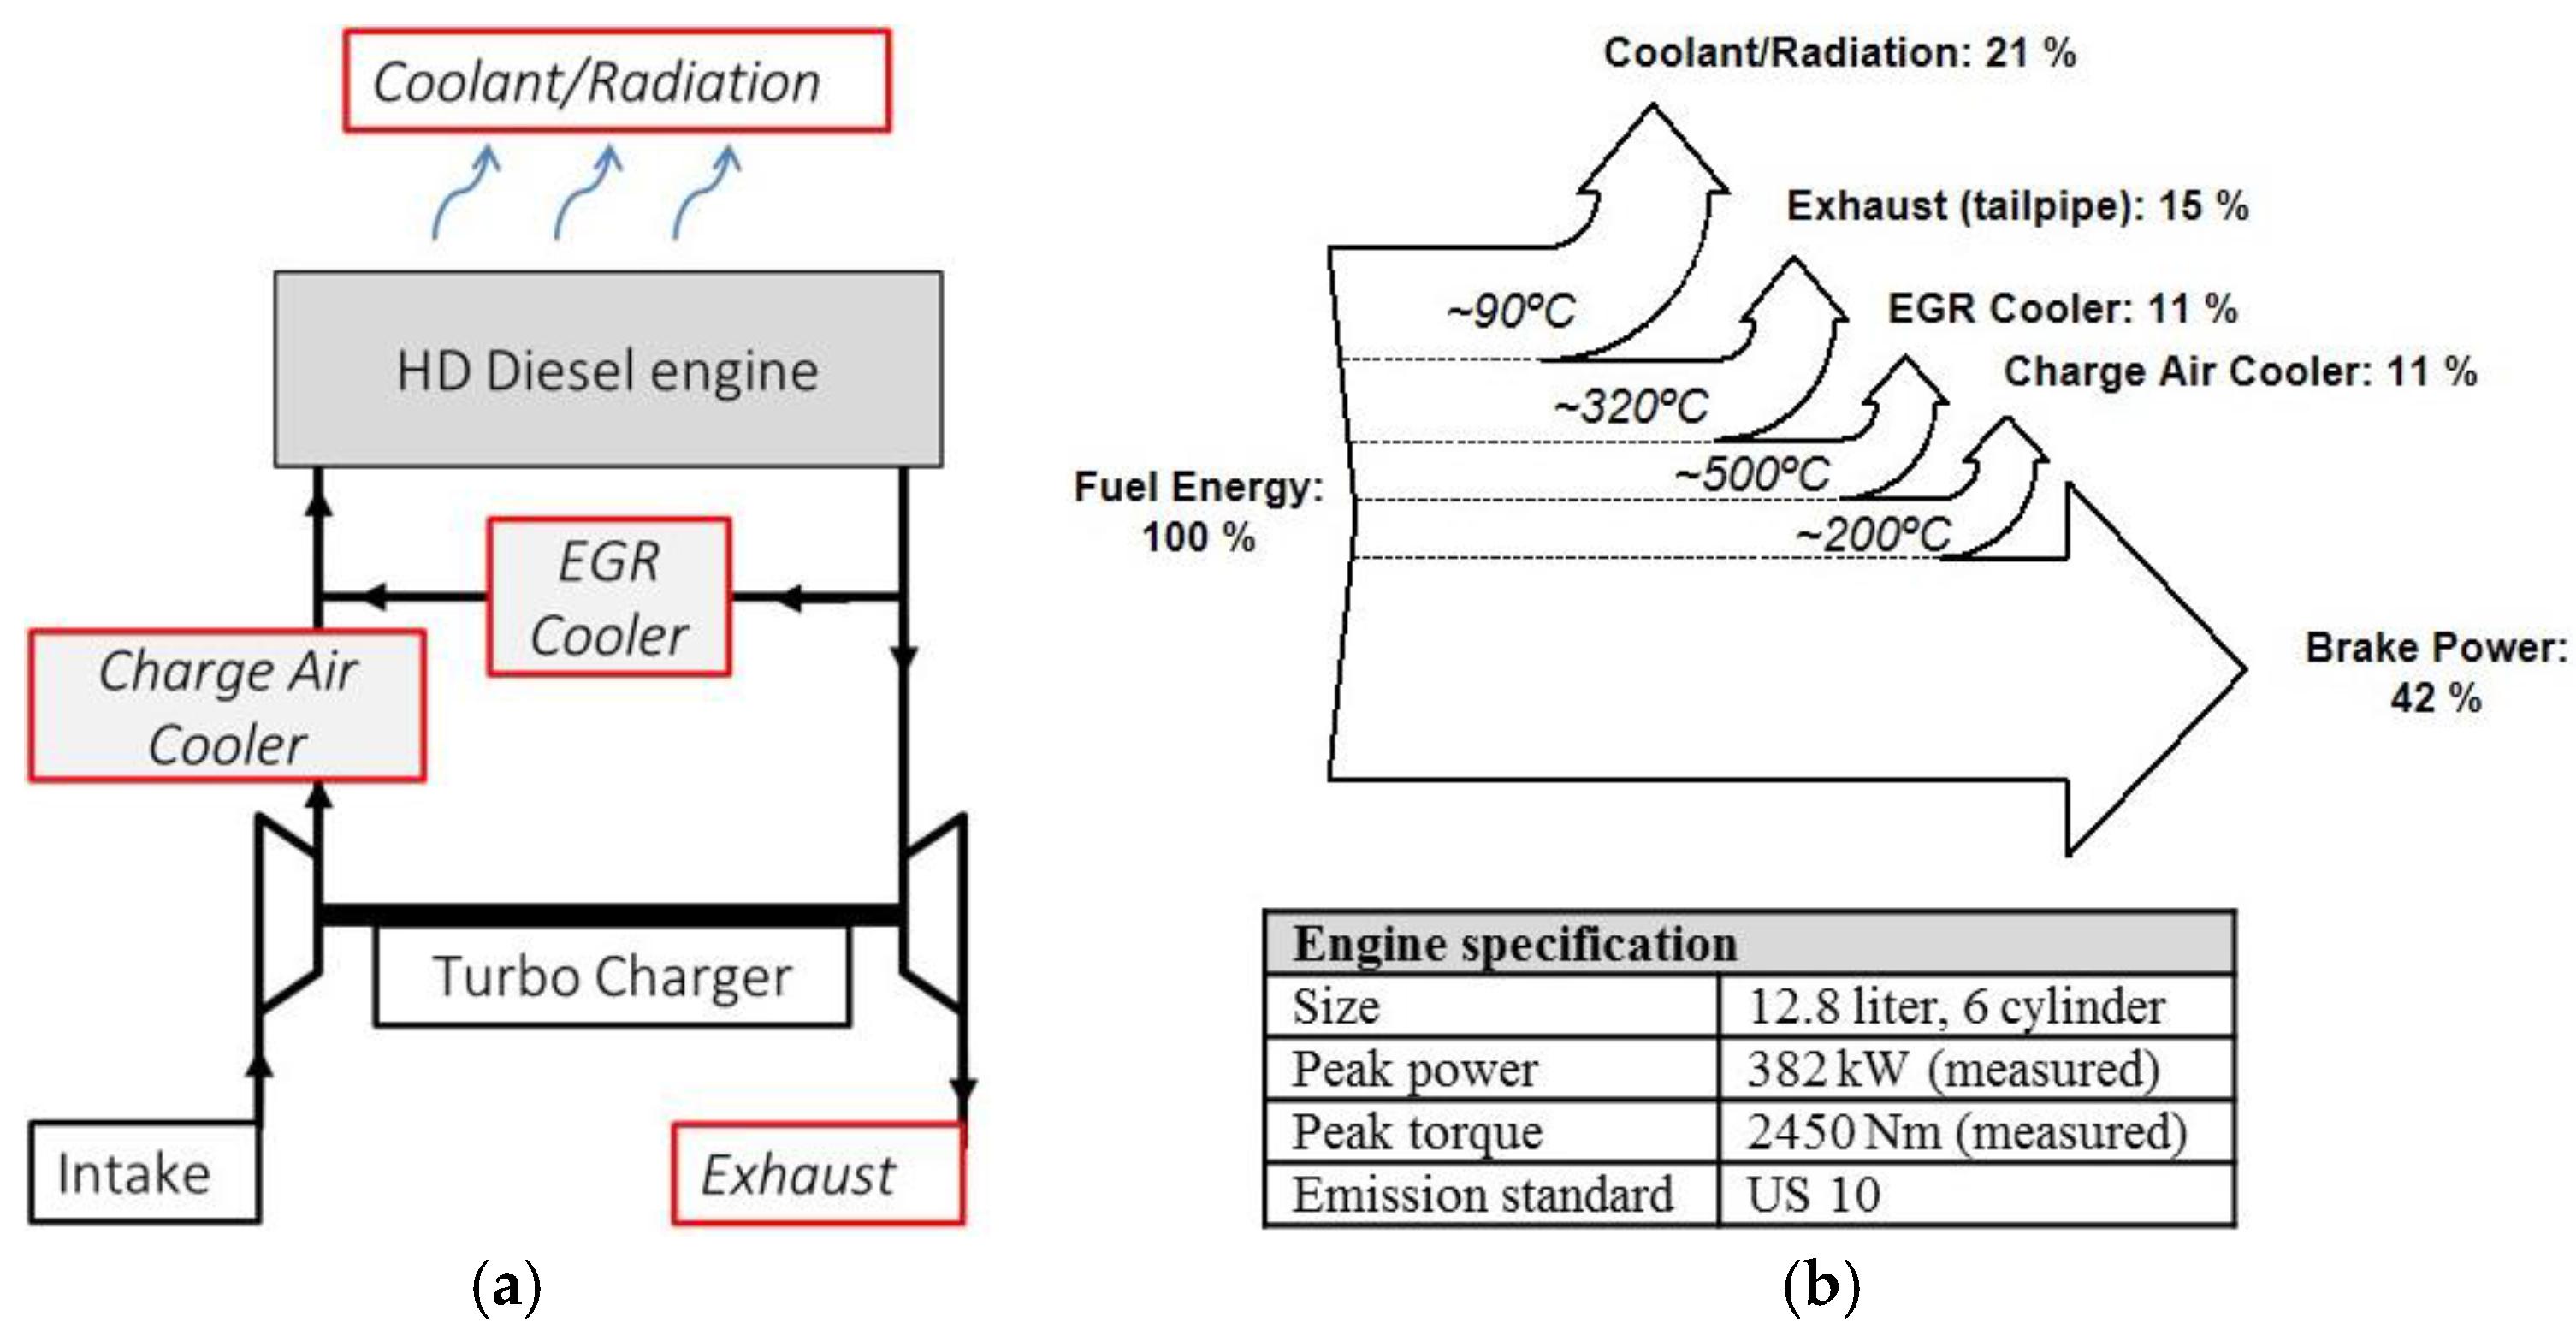 Energies Free Full Text